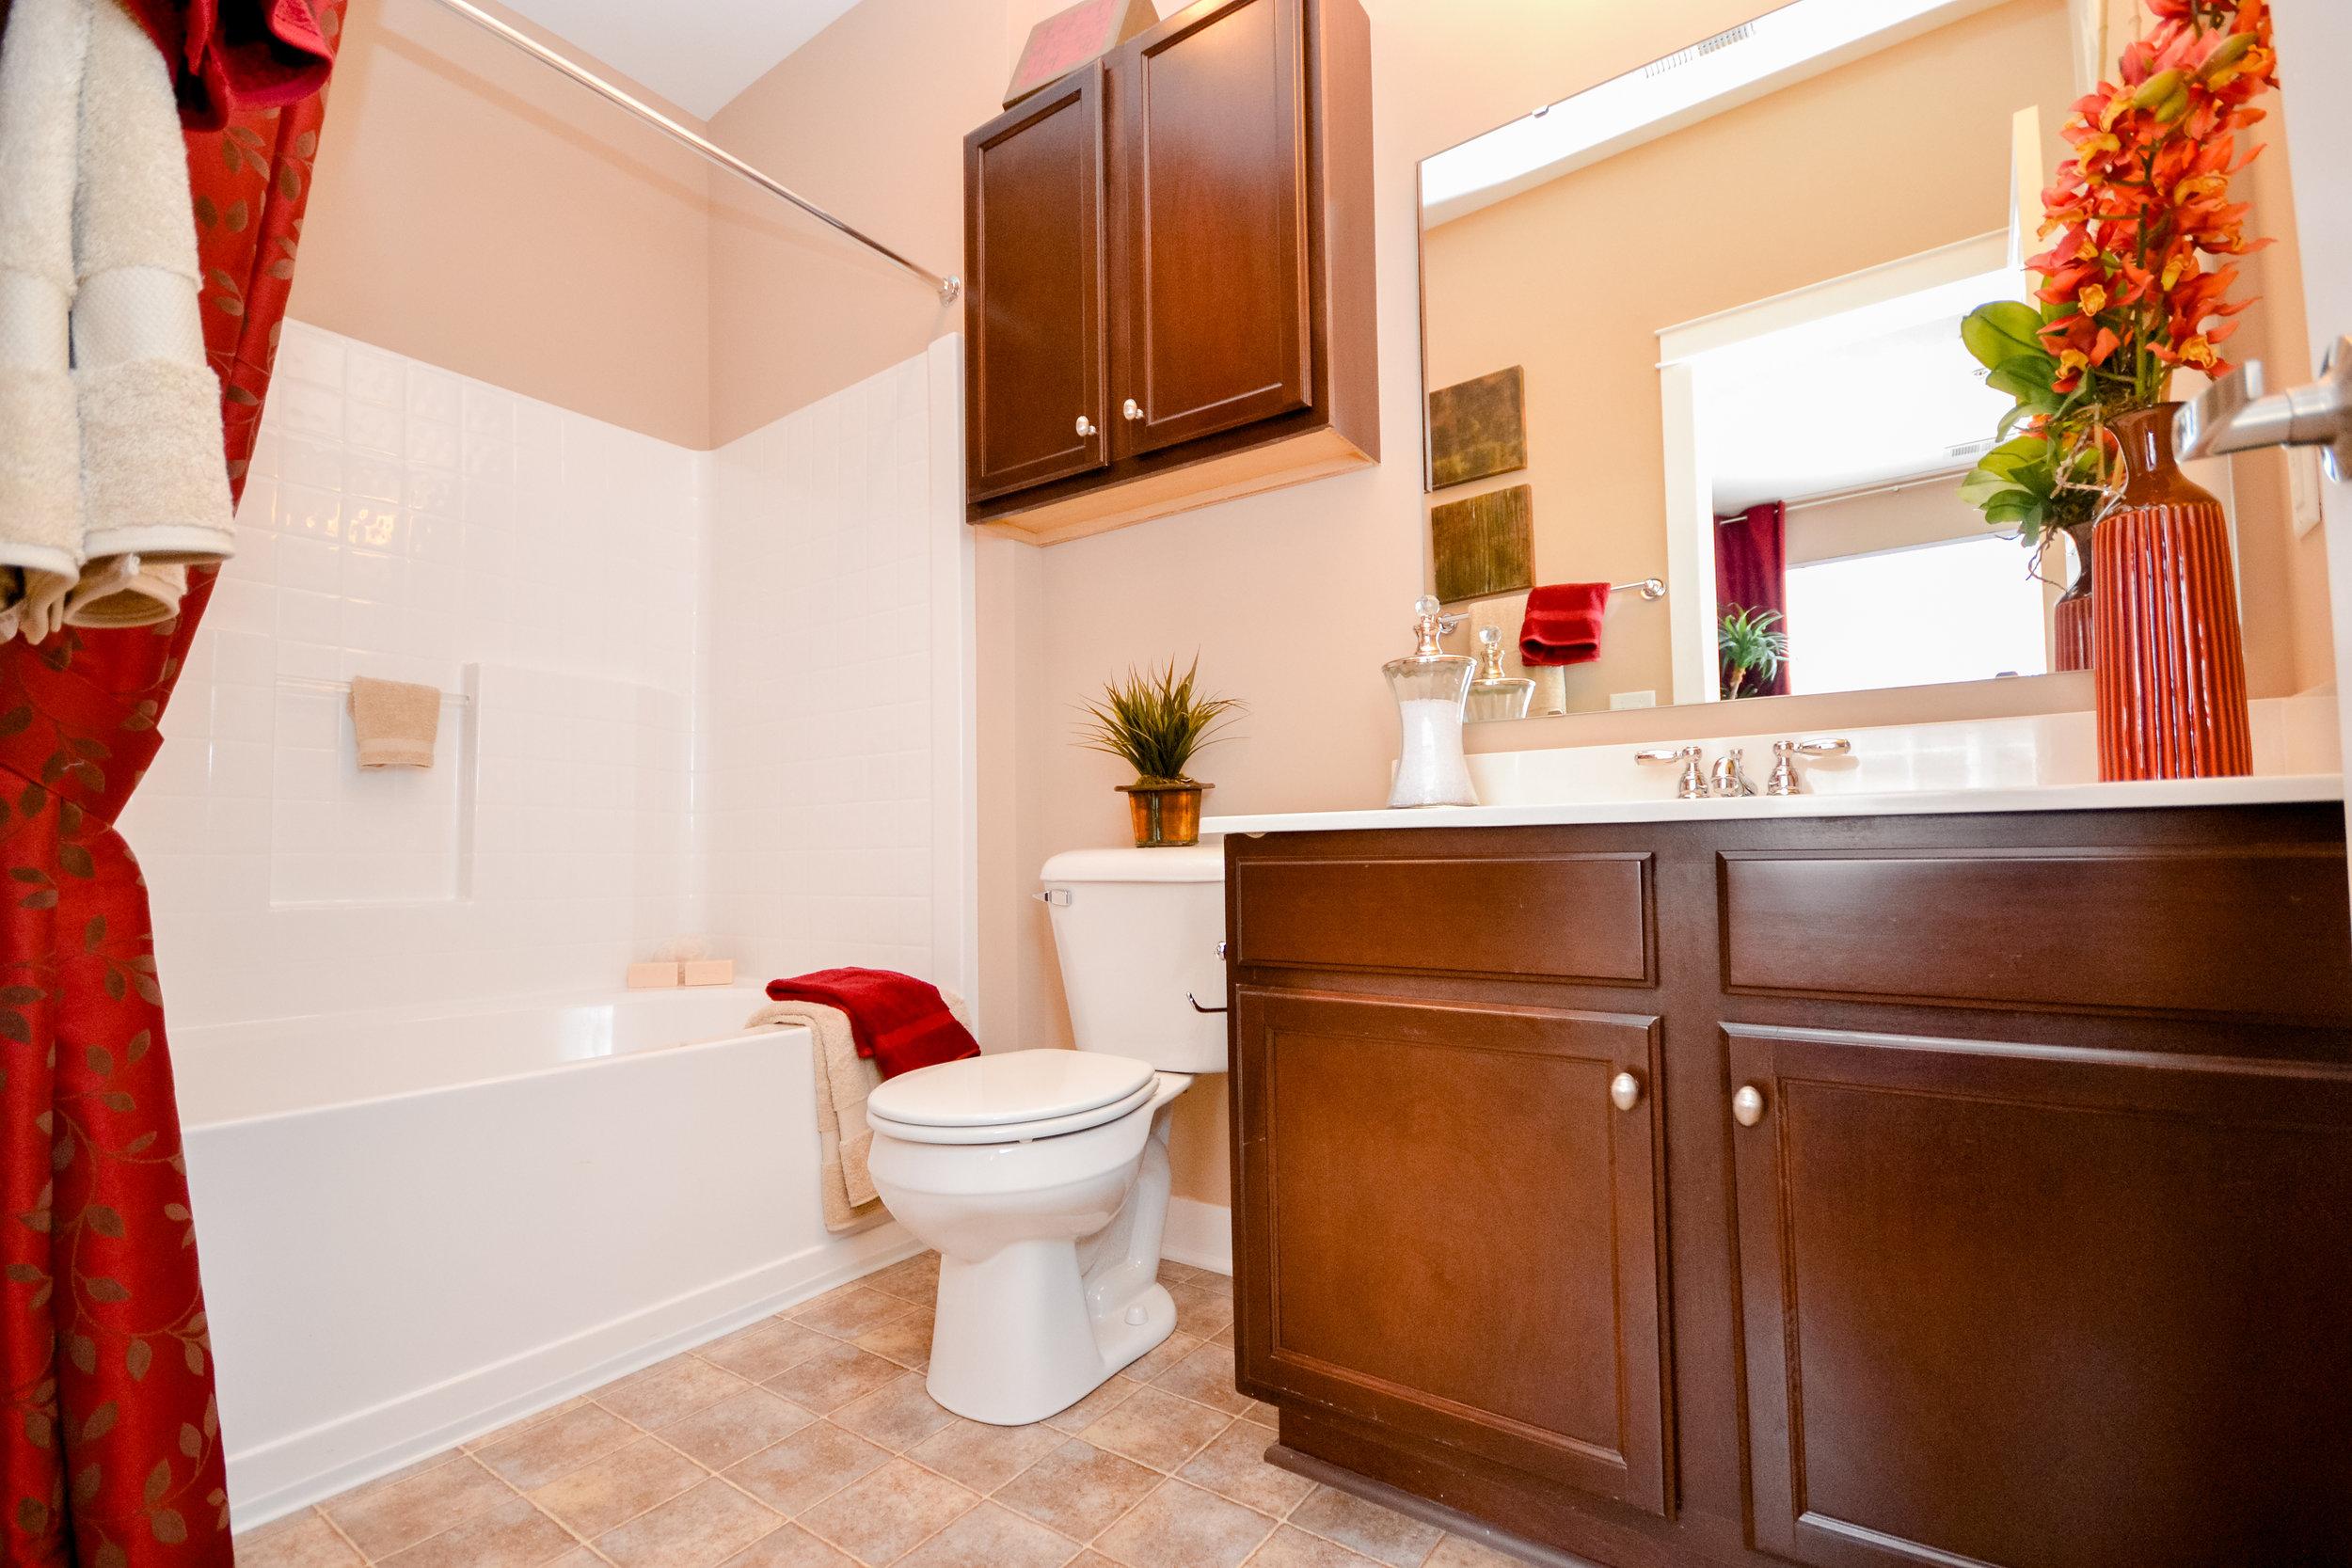 Waverley - model bathroom 1 (apartment).jpg